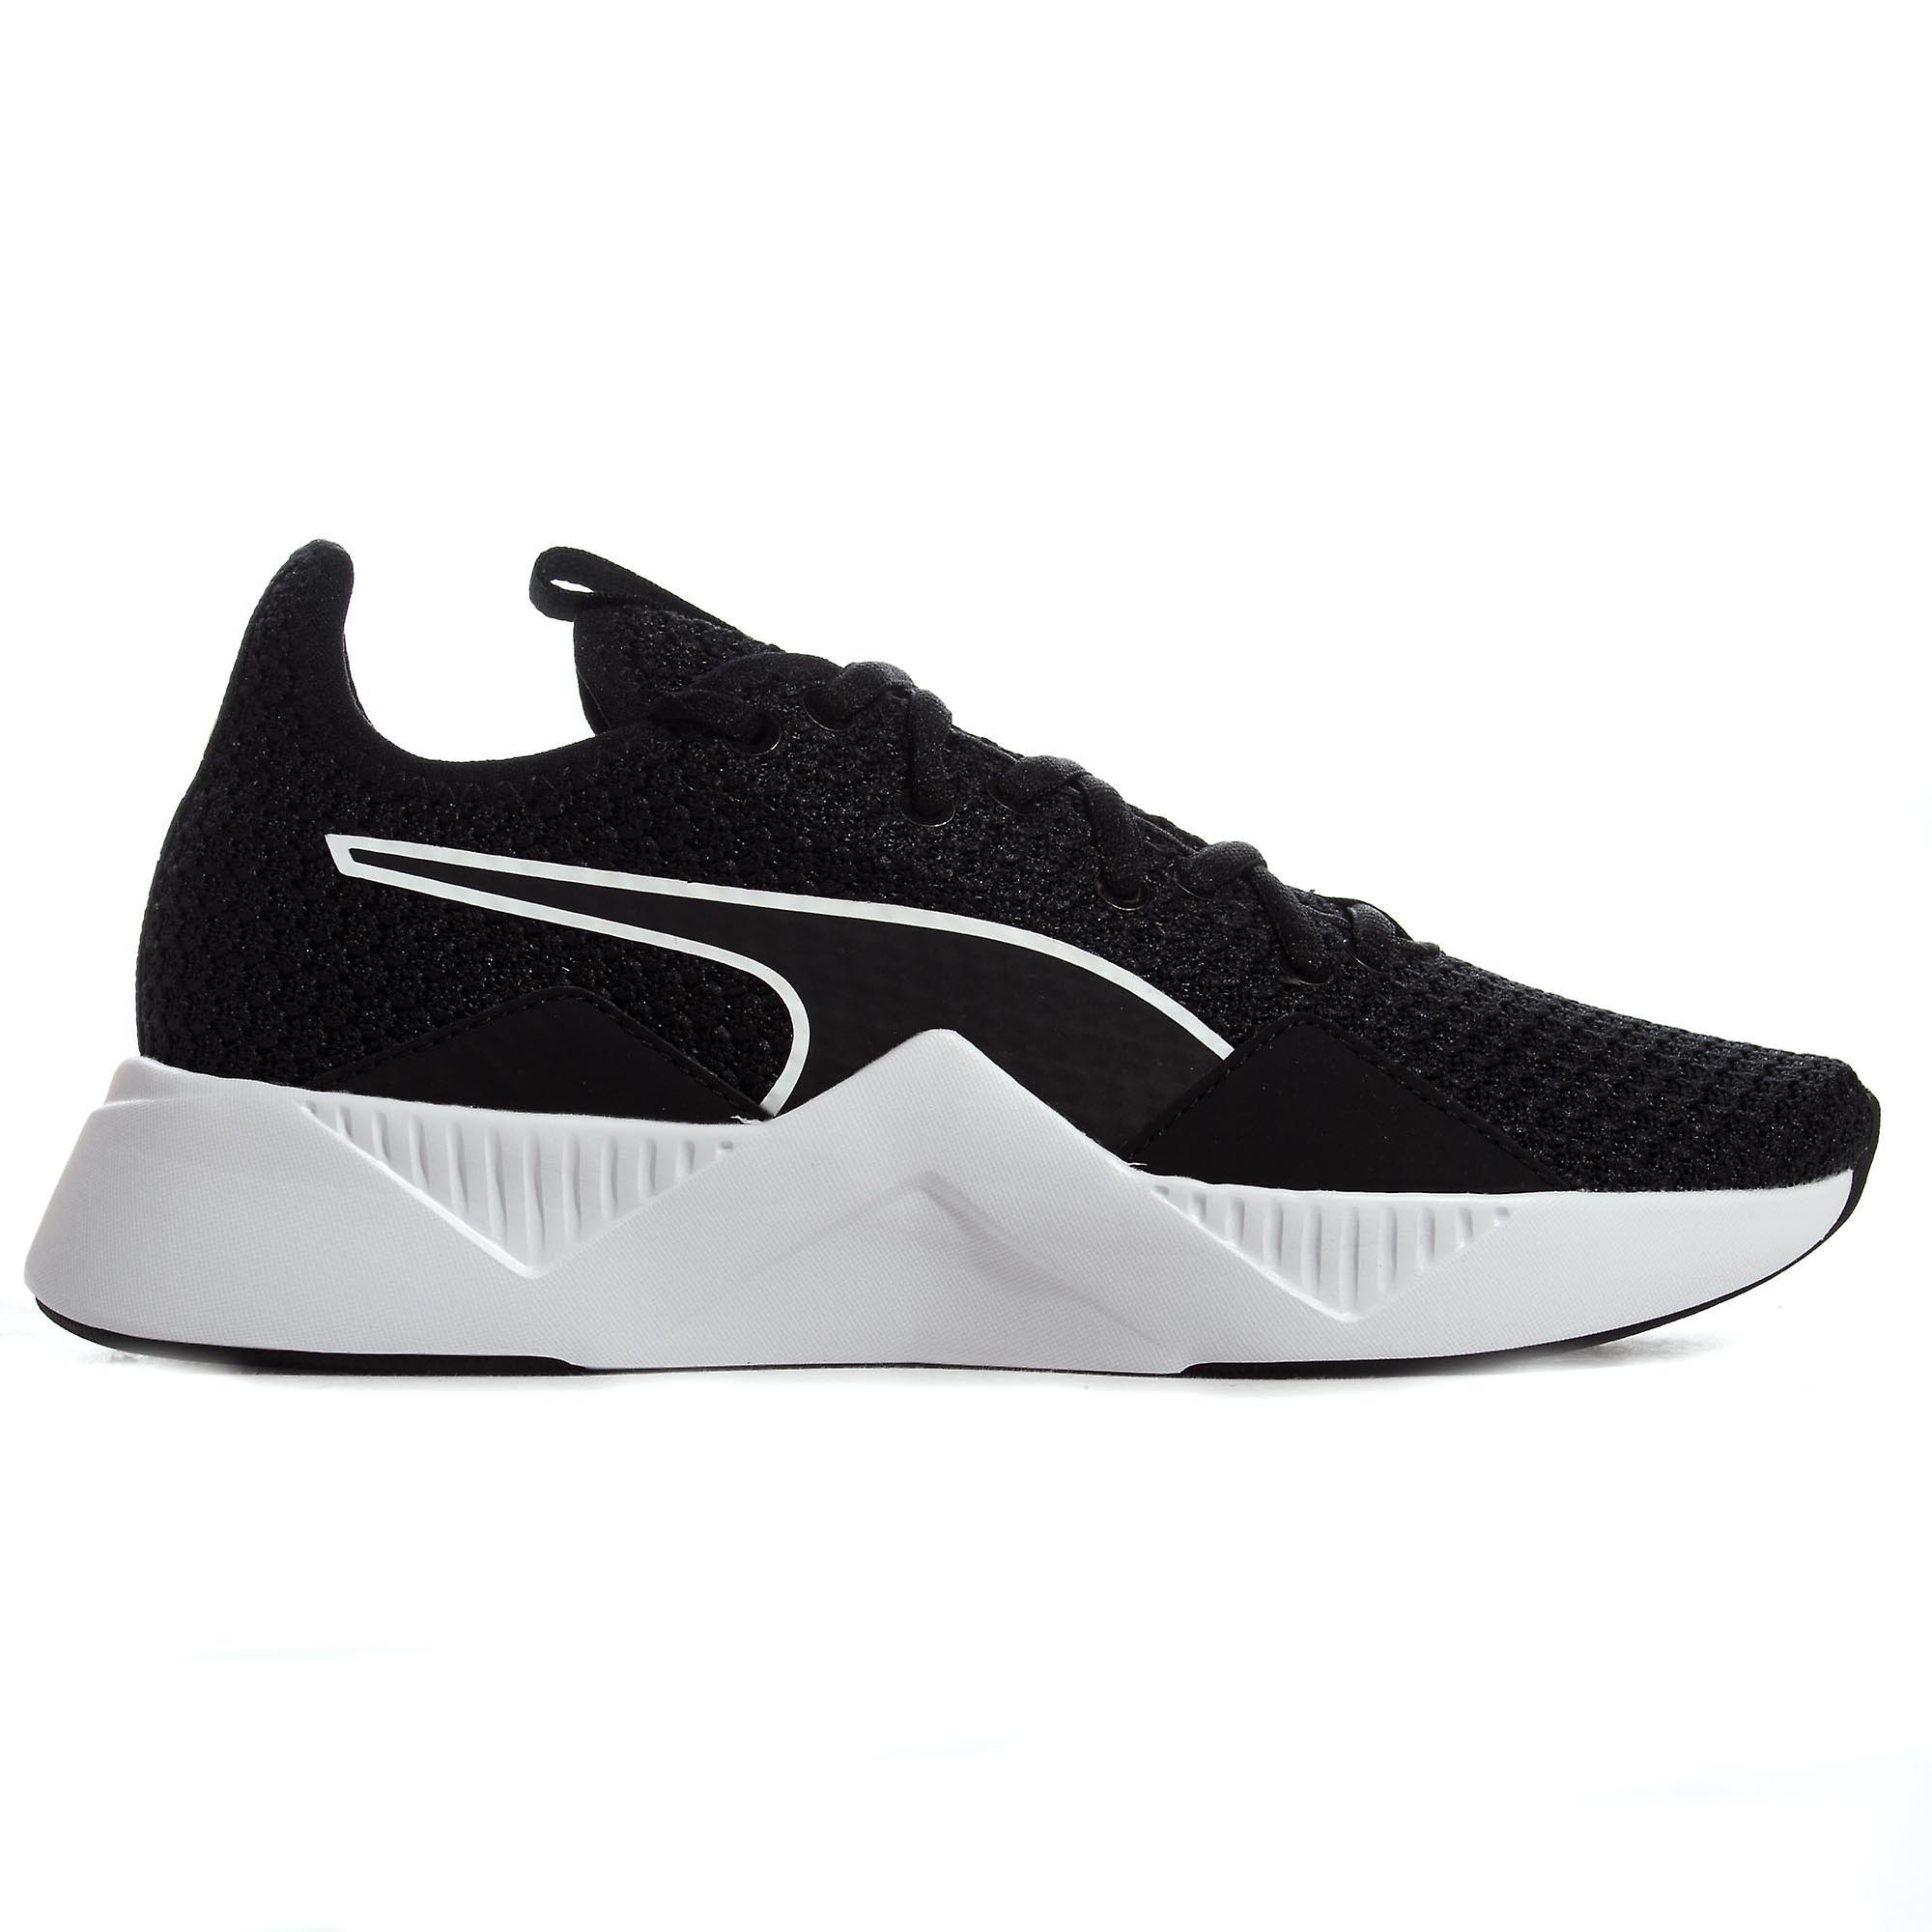 Puma Incite FS Womens Exercise Fitness Training Trainer Shoe Black/White